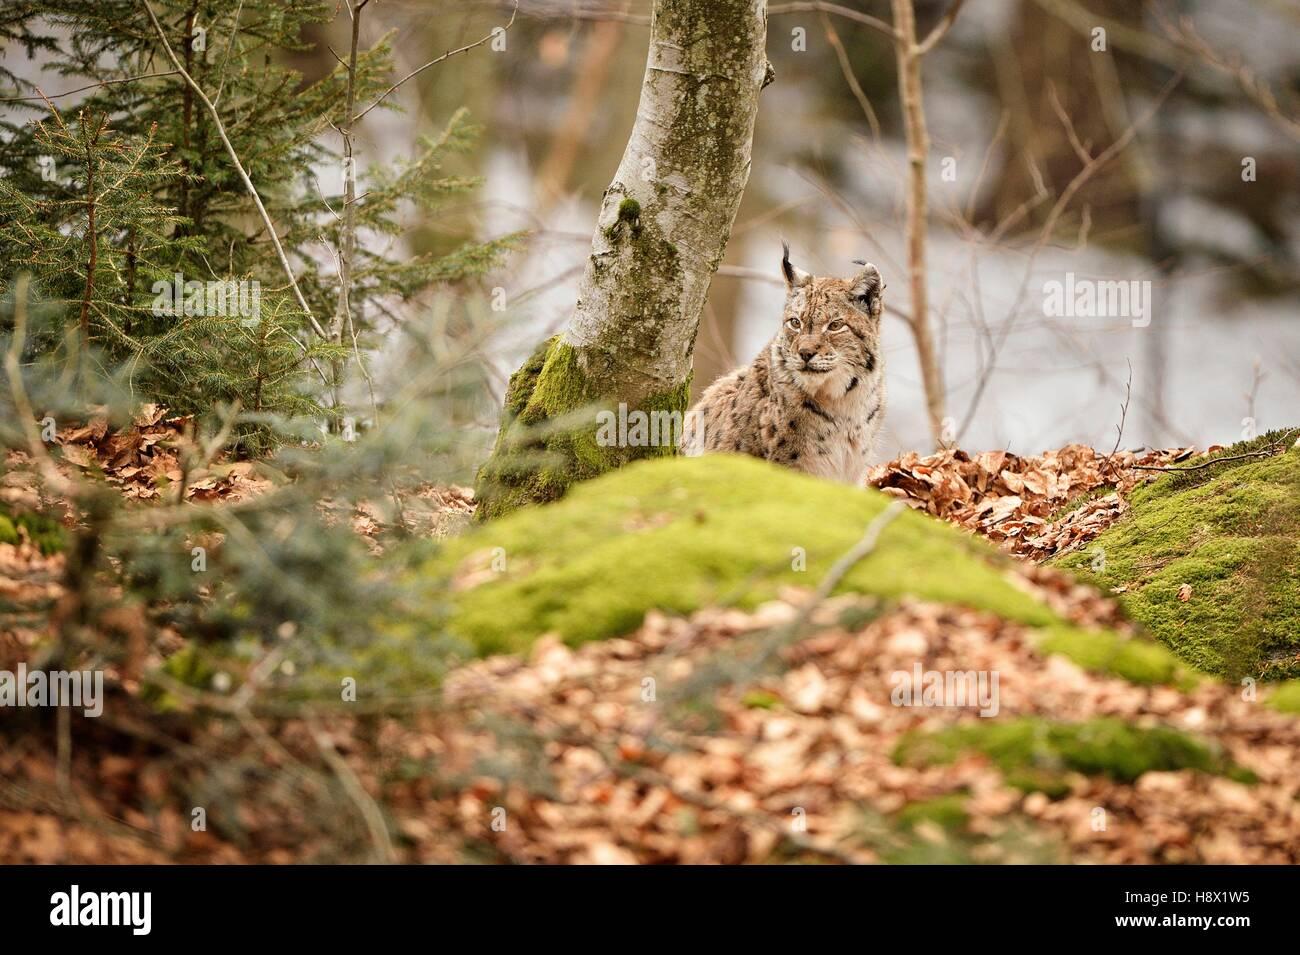 Eurasian lynx sitting in forest, Bayerischer Wald Park; Germany Stock Photo